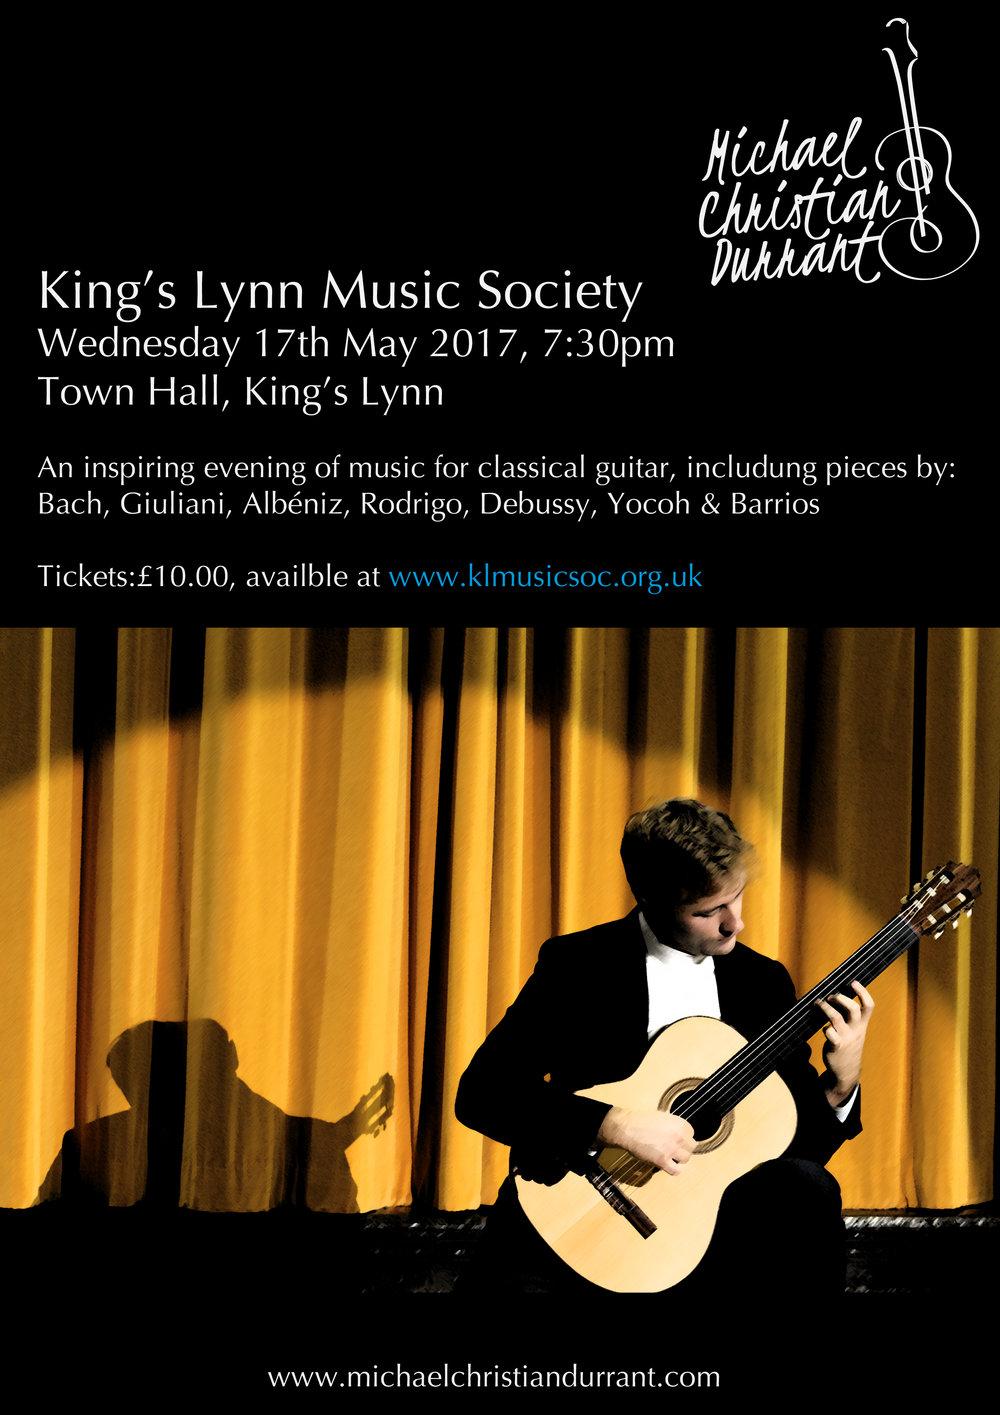 King's Lynn Music Society, Wednesday 17th May 2017